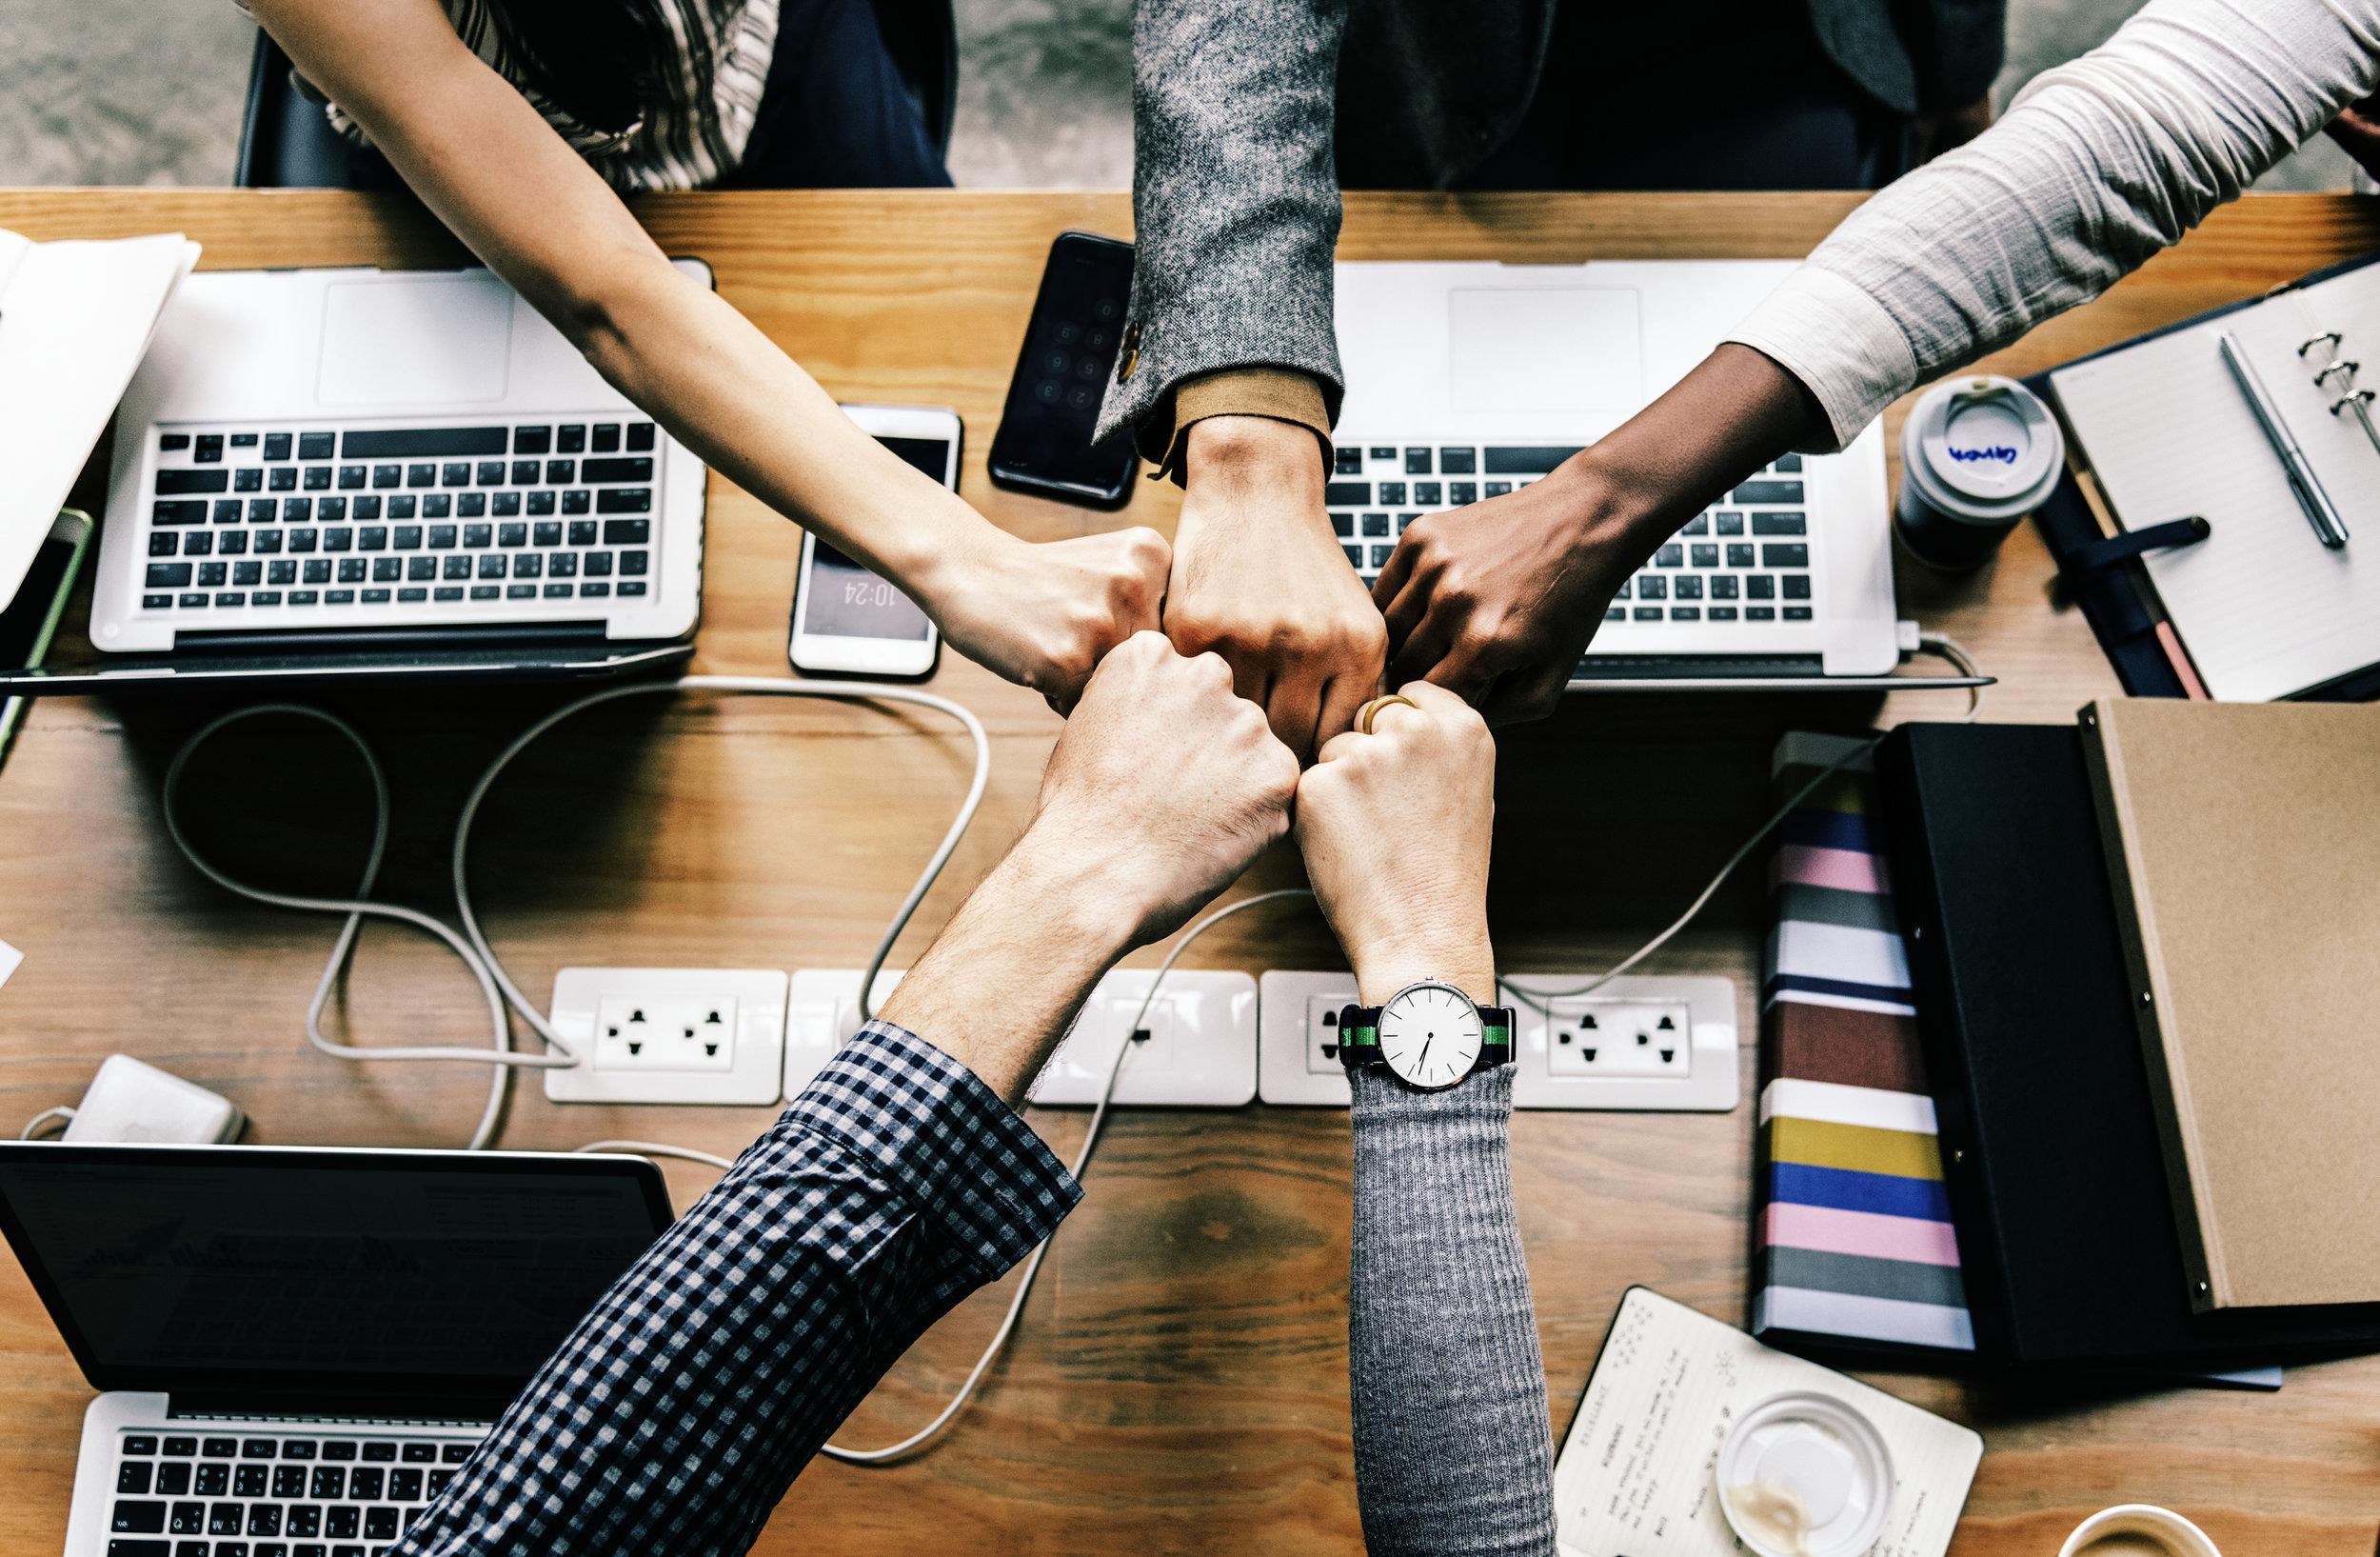 Collaborate. Innovate. -